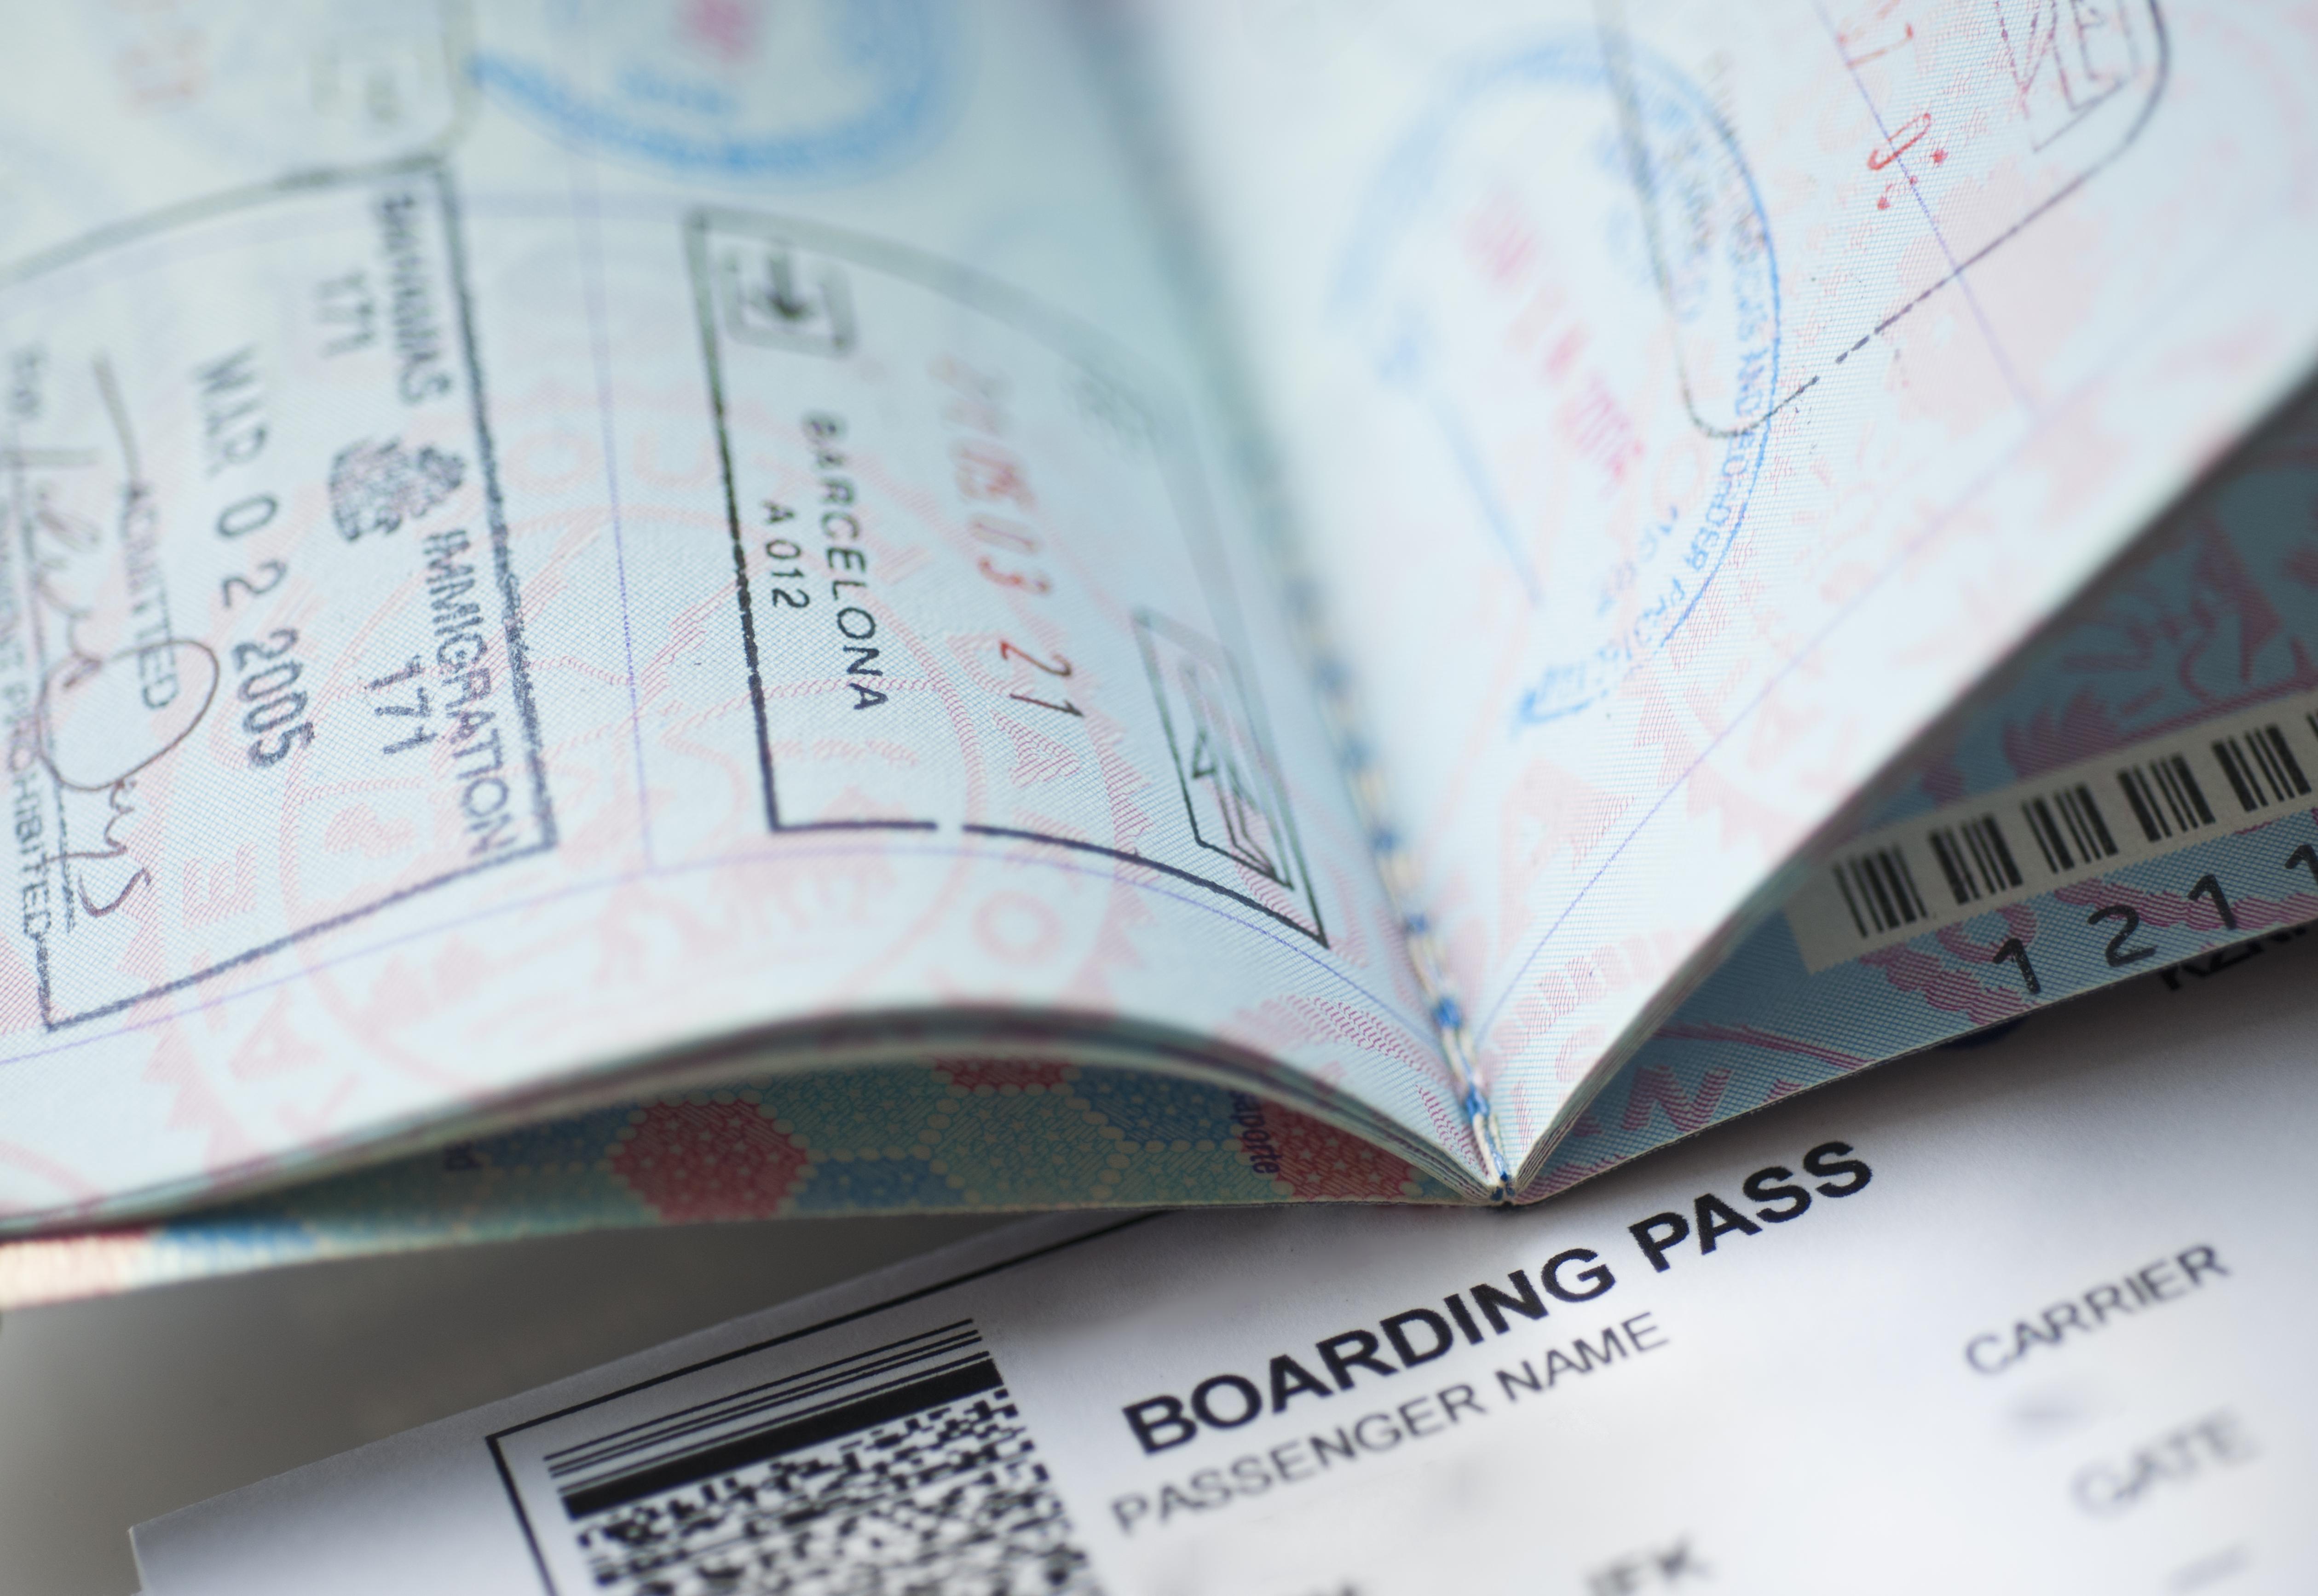 Passport with boarding pass inside